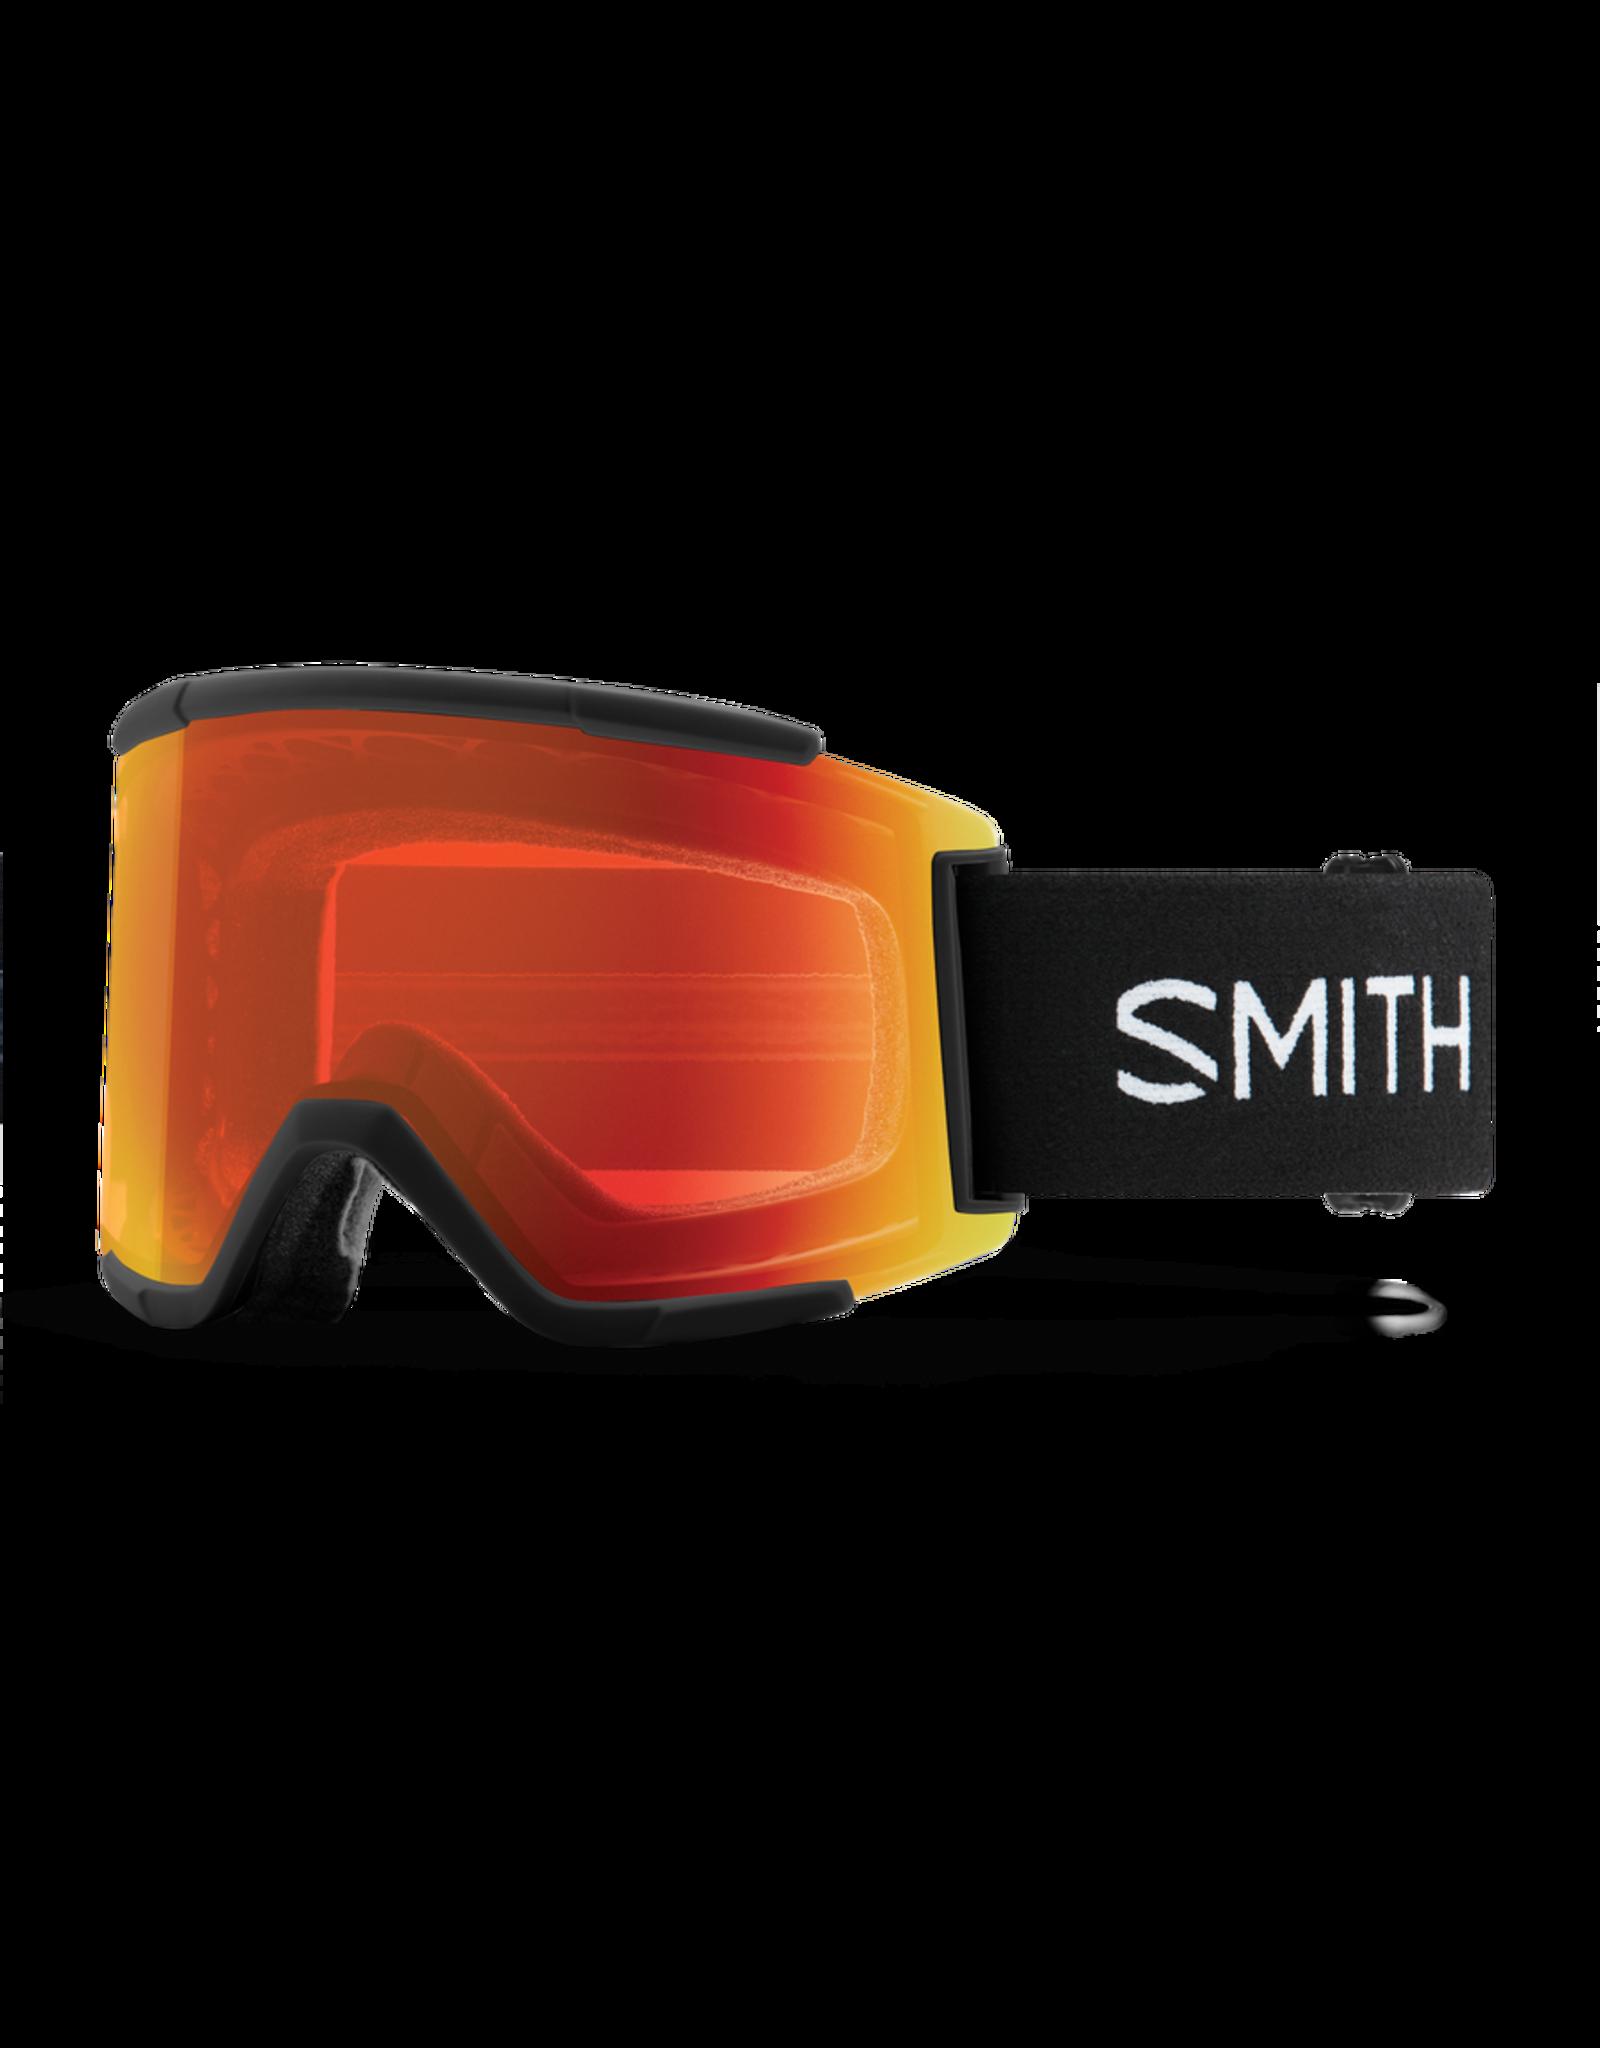 SMITH SQUAD XL BLACK EVERYDAY RED MIRROR W21